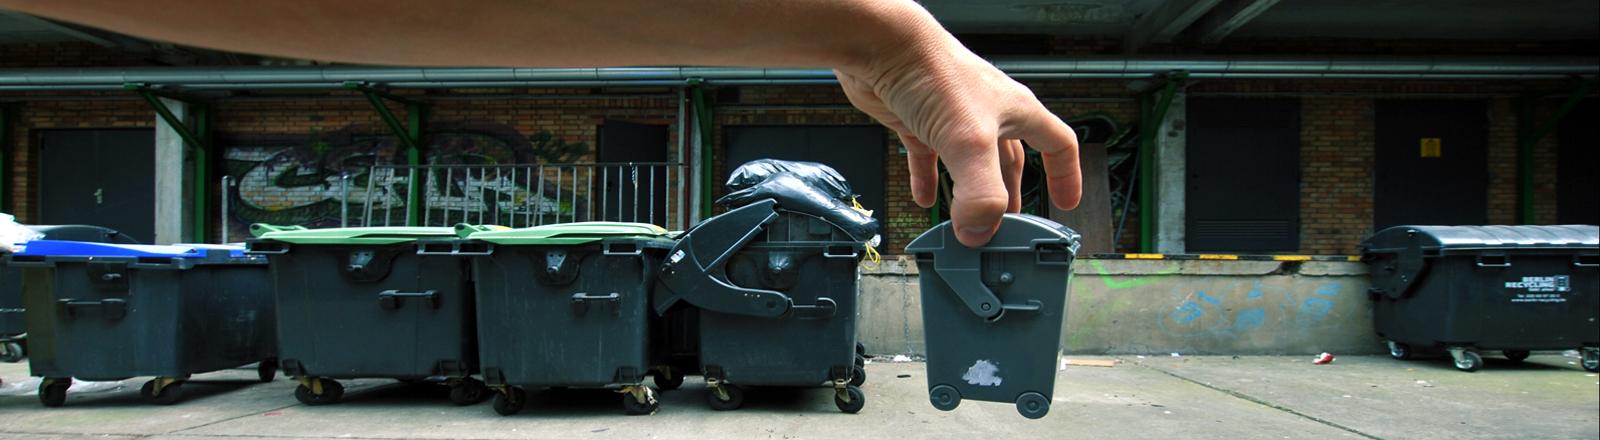 Hand packt Müllcontainer beiseite